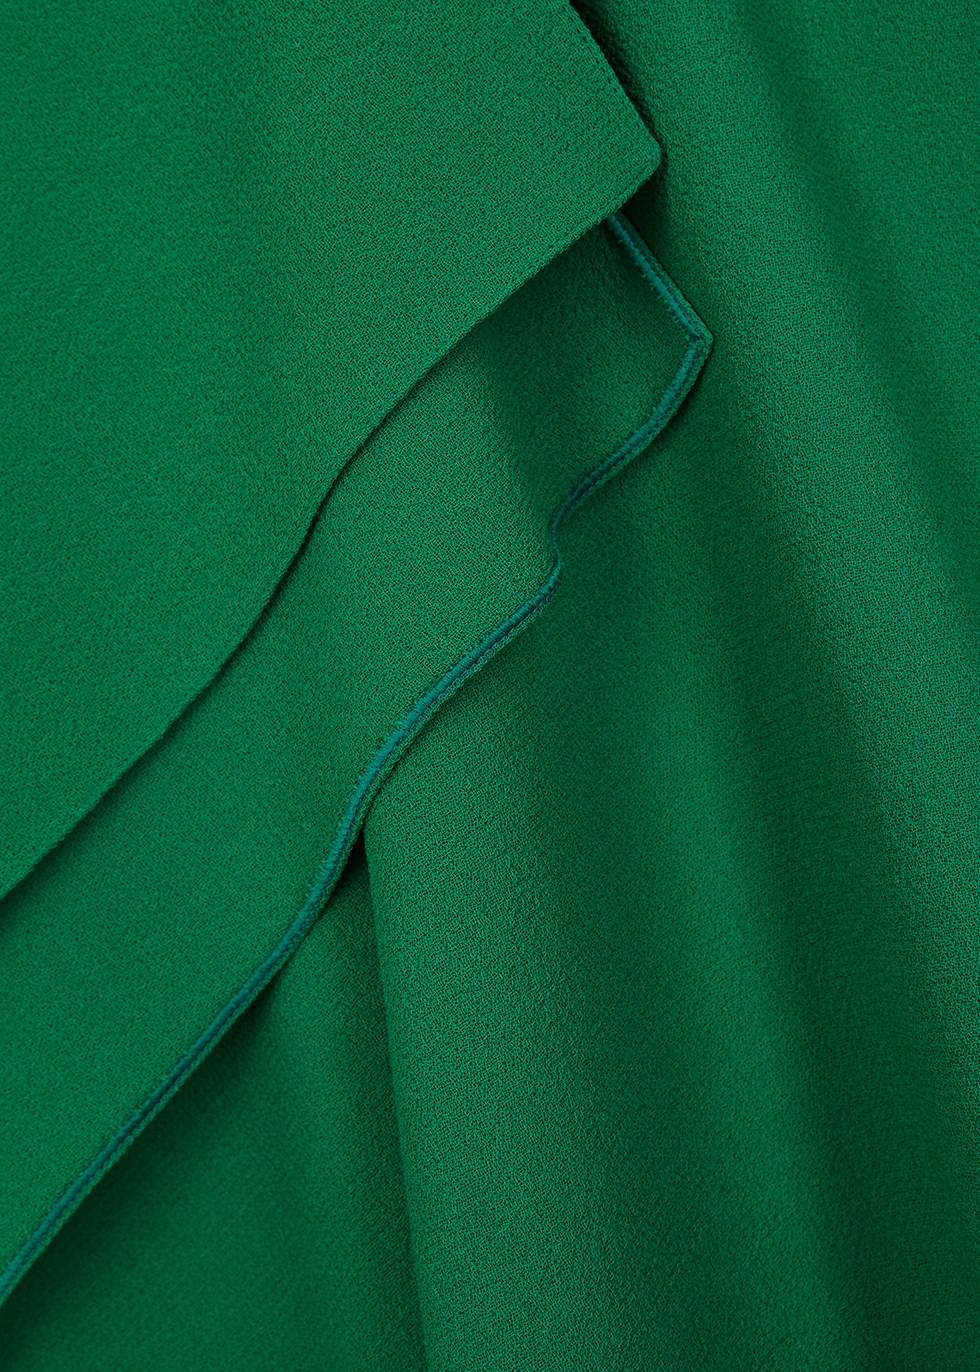 Barwick green wool midi dress - Roland Mouret